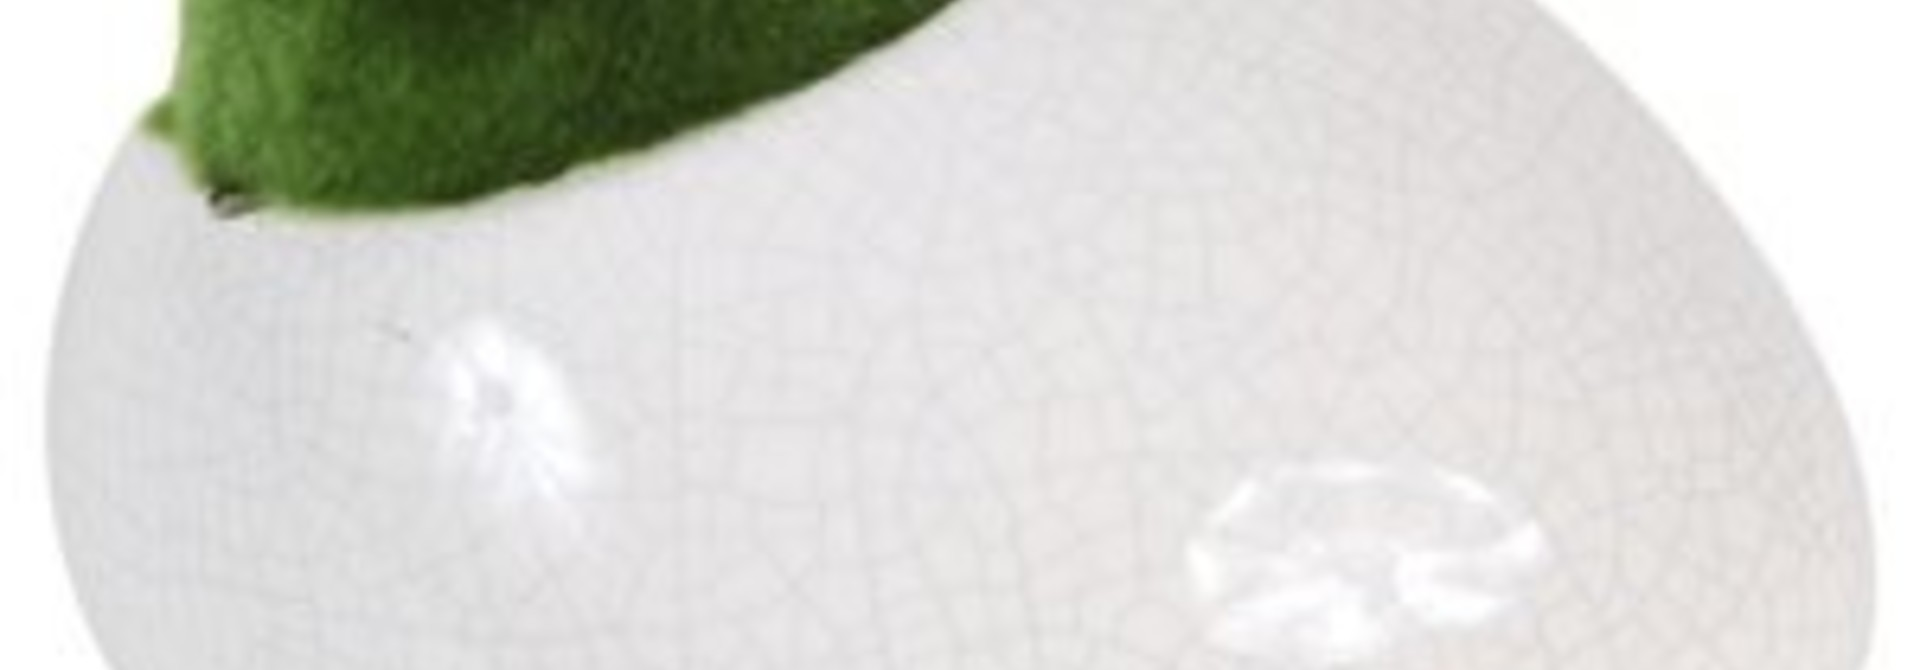 "Fluval Ceramic Ornament with Moss, White, Medium, 13 x 11 x 8.1 cm (5.1 x 4.3 x 3.2"")"